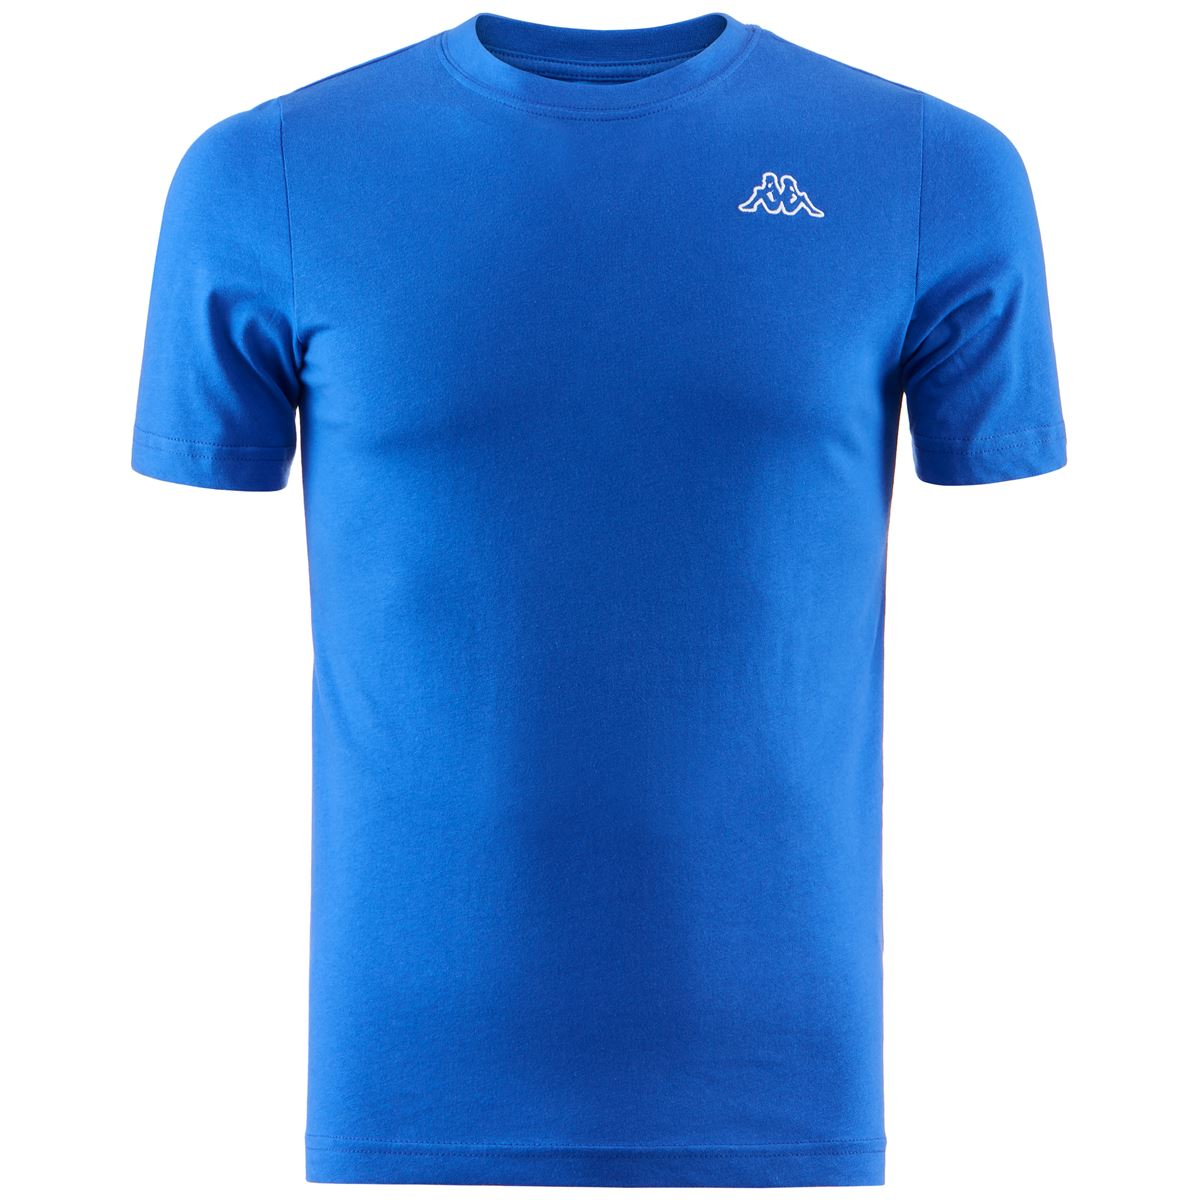 T-SHIRT KAPPA KAPPA | T-shirt m/m | 304J150741